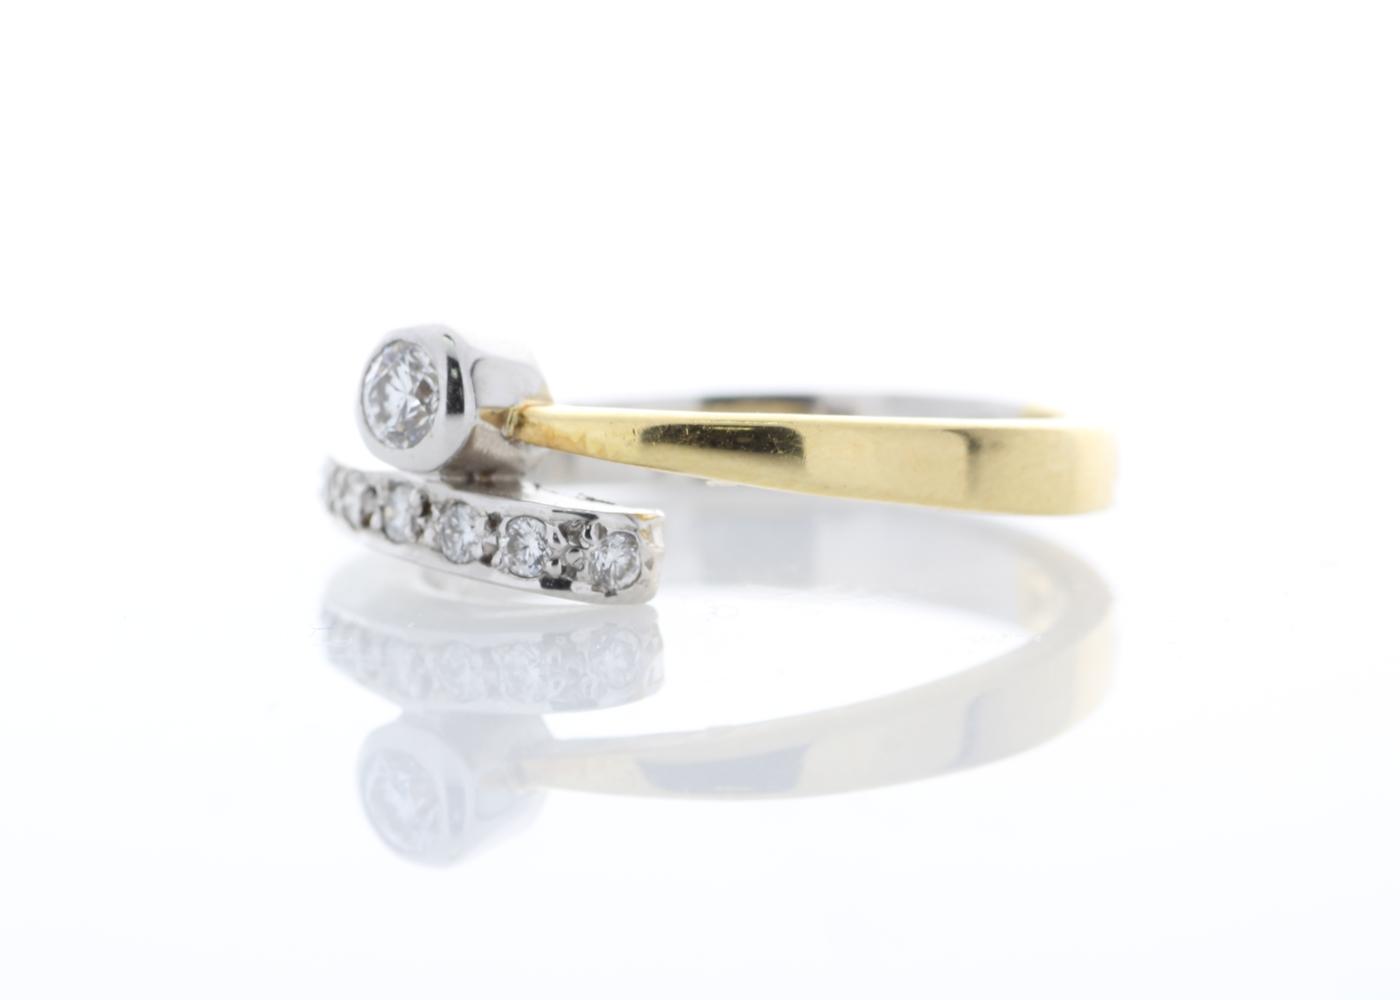 18ct Stone Set Shoulders Diamond Ring 0.11 Carats - Image 2 of 5